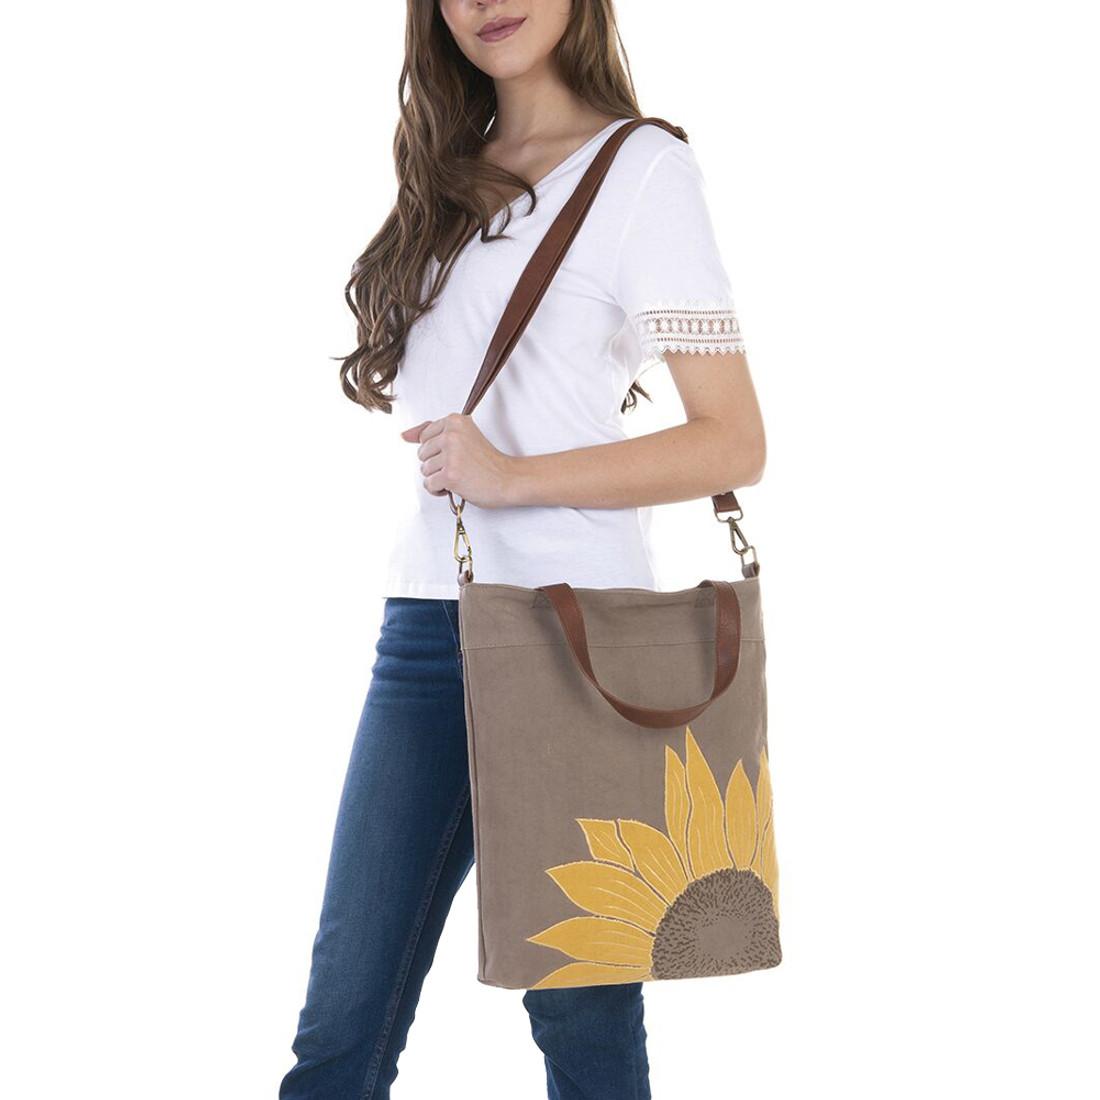 Mona B. Sunflower Canvas Tote Bag model view